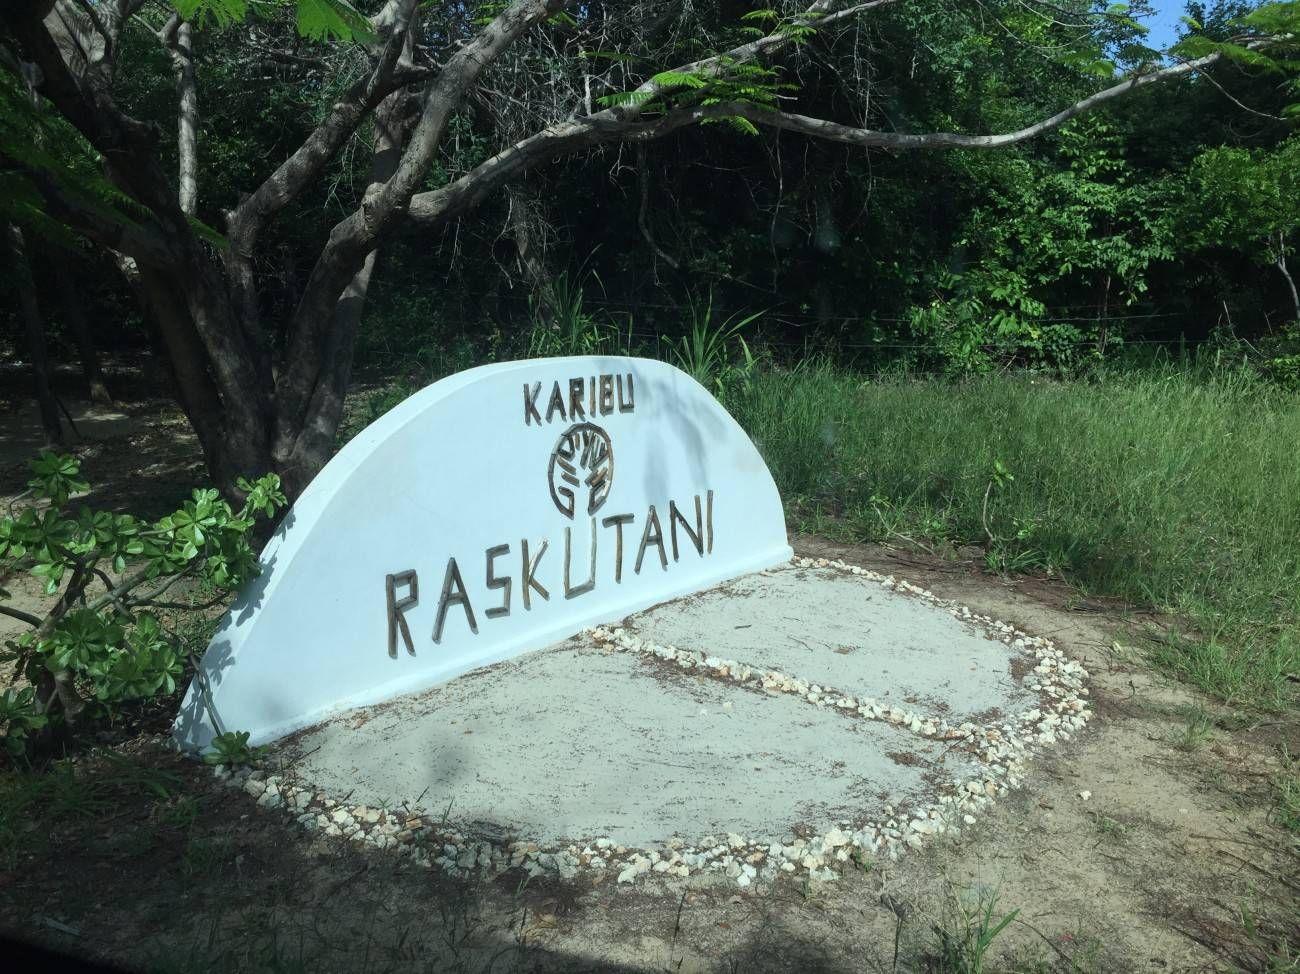 Ras Kutani Tanzania-016